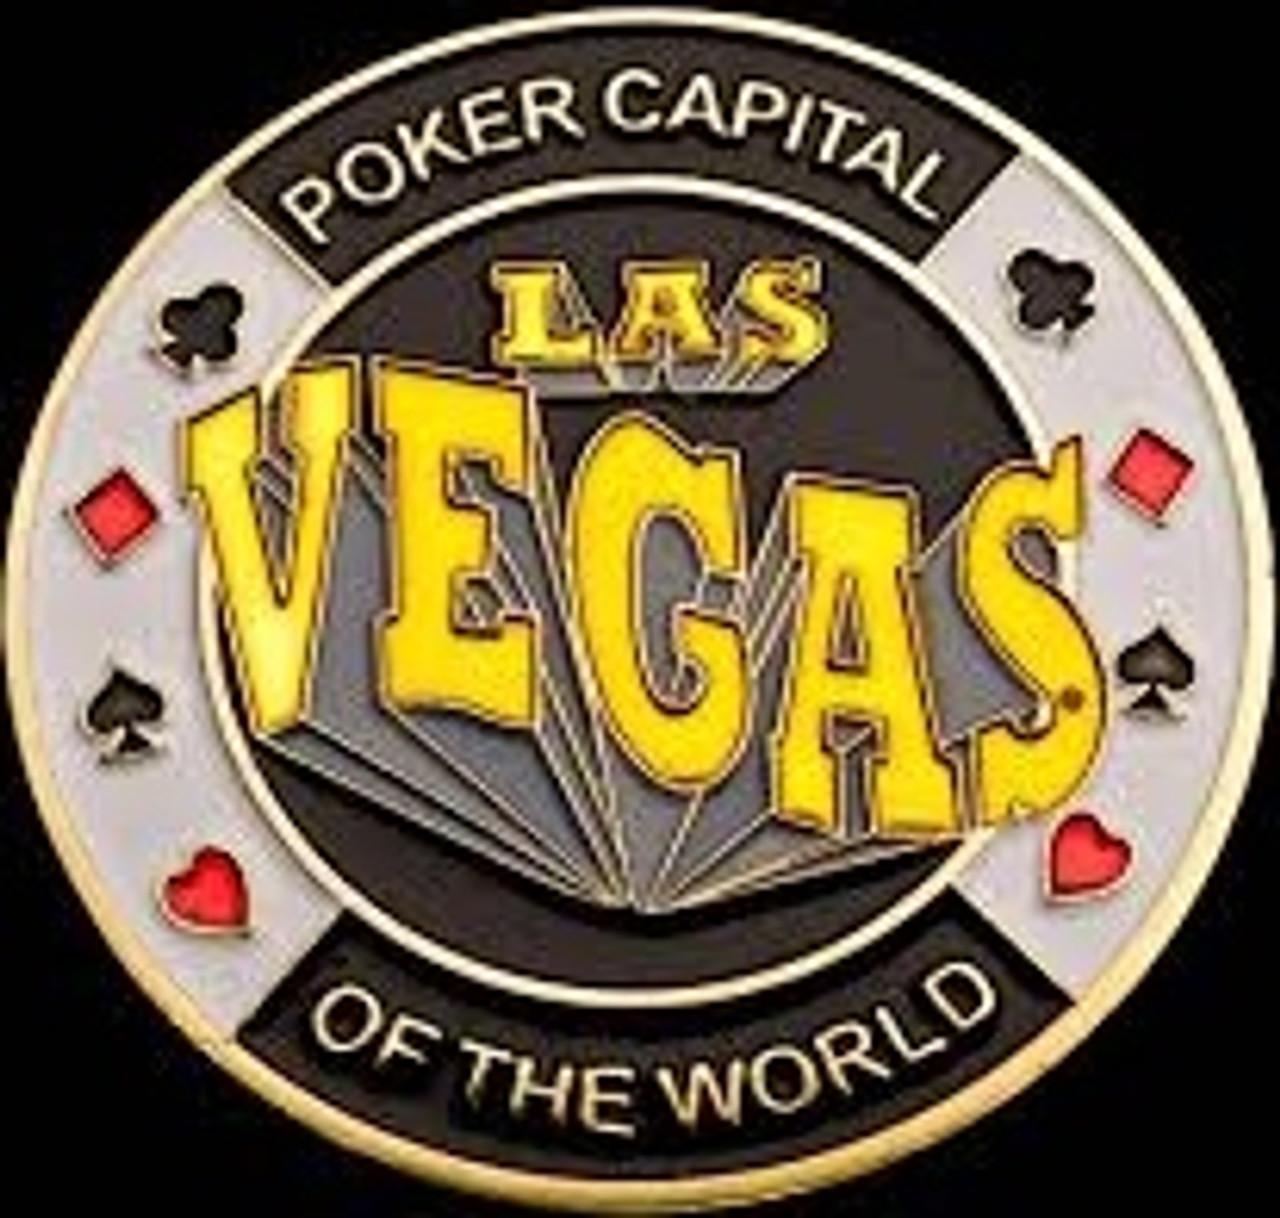 Las Vegas Casino 11.5g Poker Chip 300 pc Set with Case & FREE OFFER